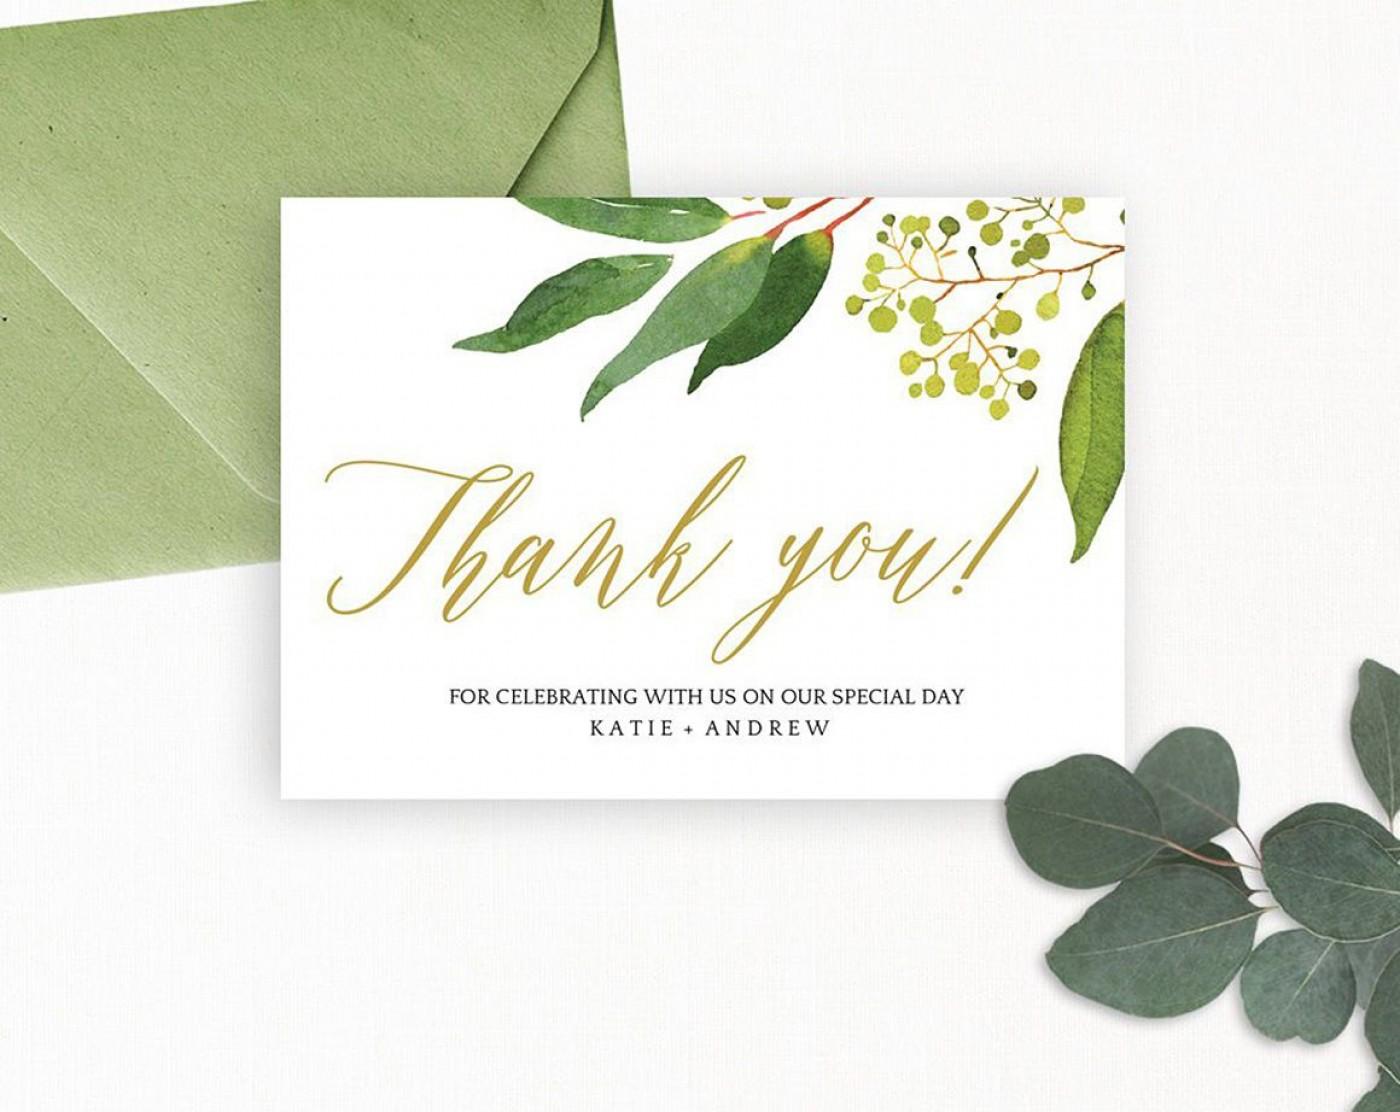 008 Sensational Wedding Thank You Card Template High Definition  Photoshop Word Etsy1400